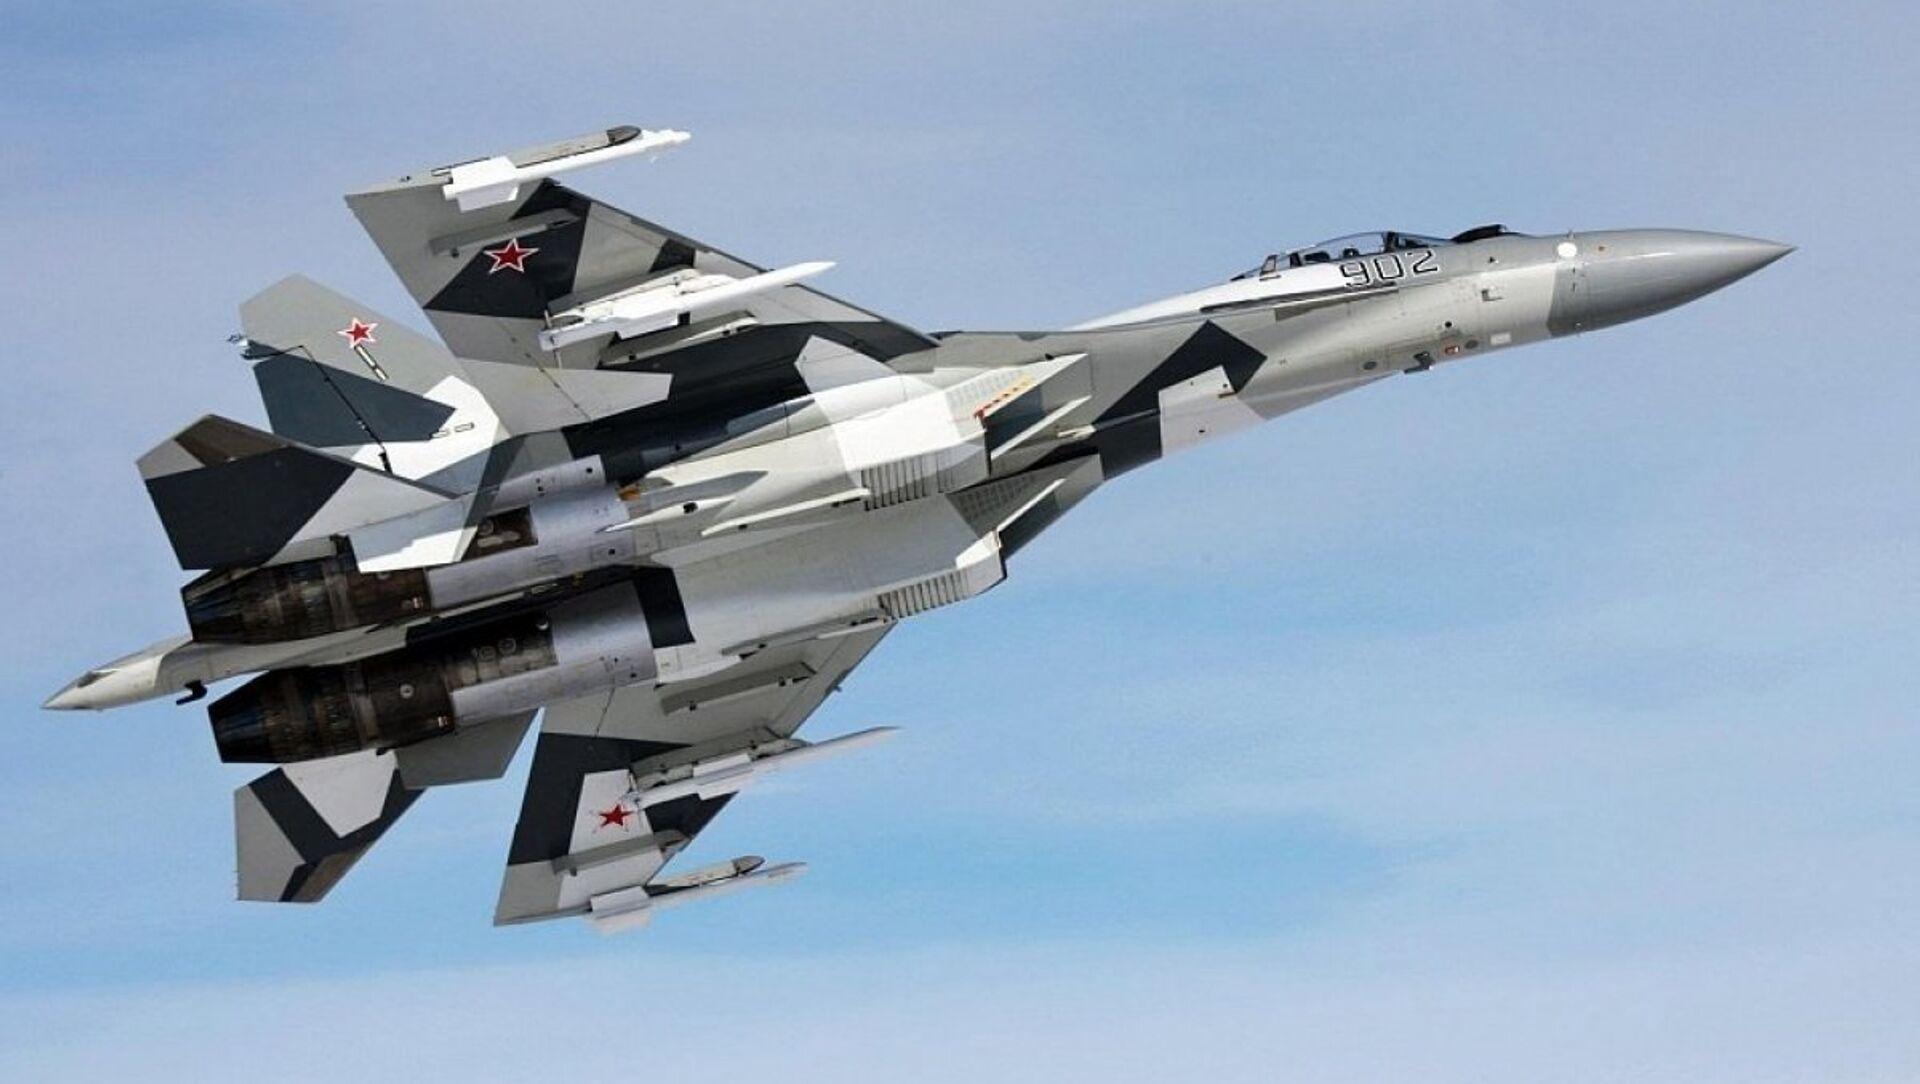 Rus Su-35 savaş uçağı - Sputnik Türkiye, 1920, 01.08.2021